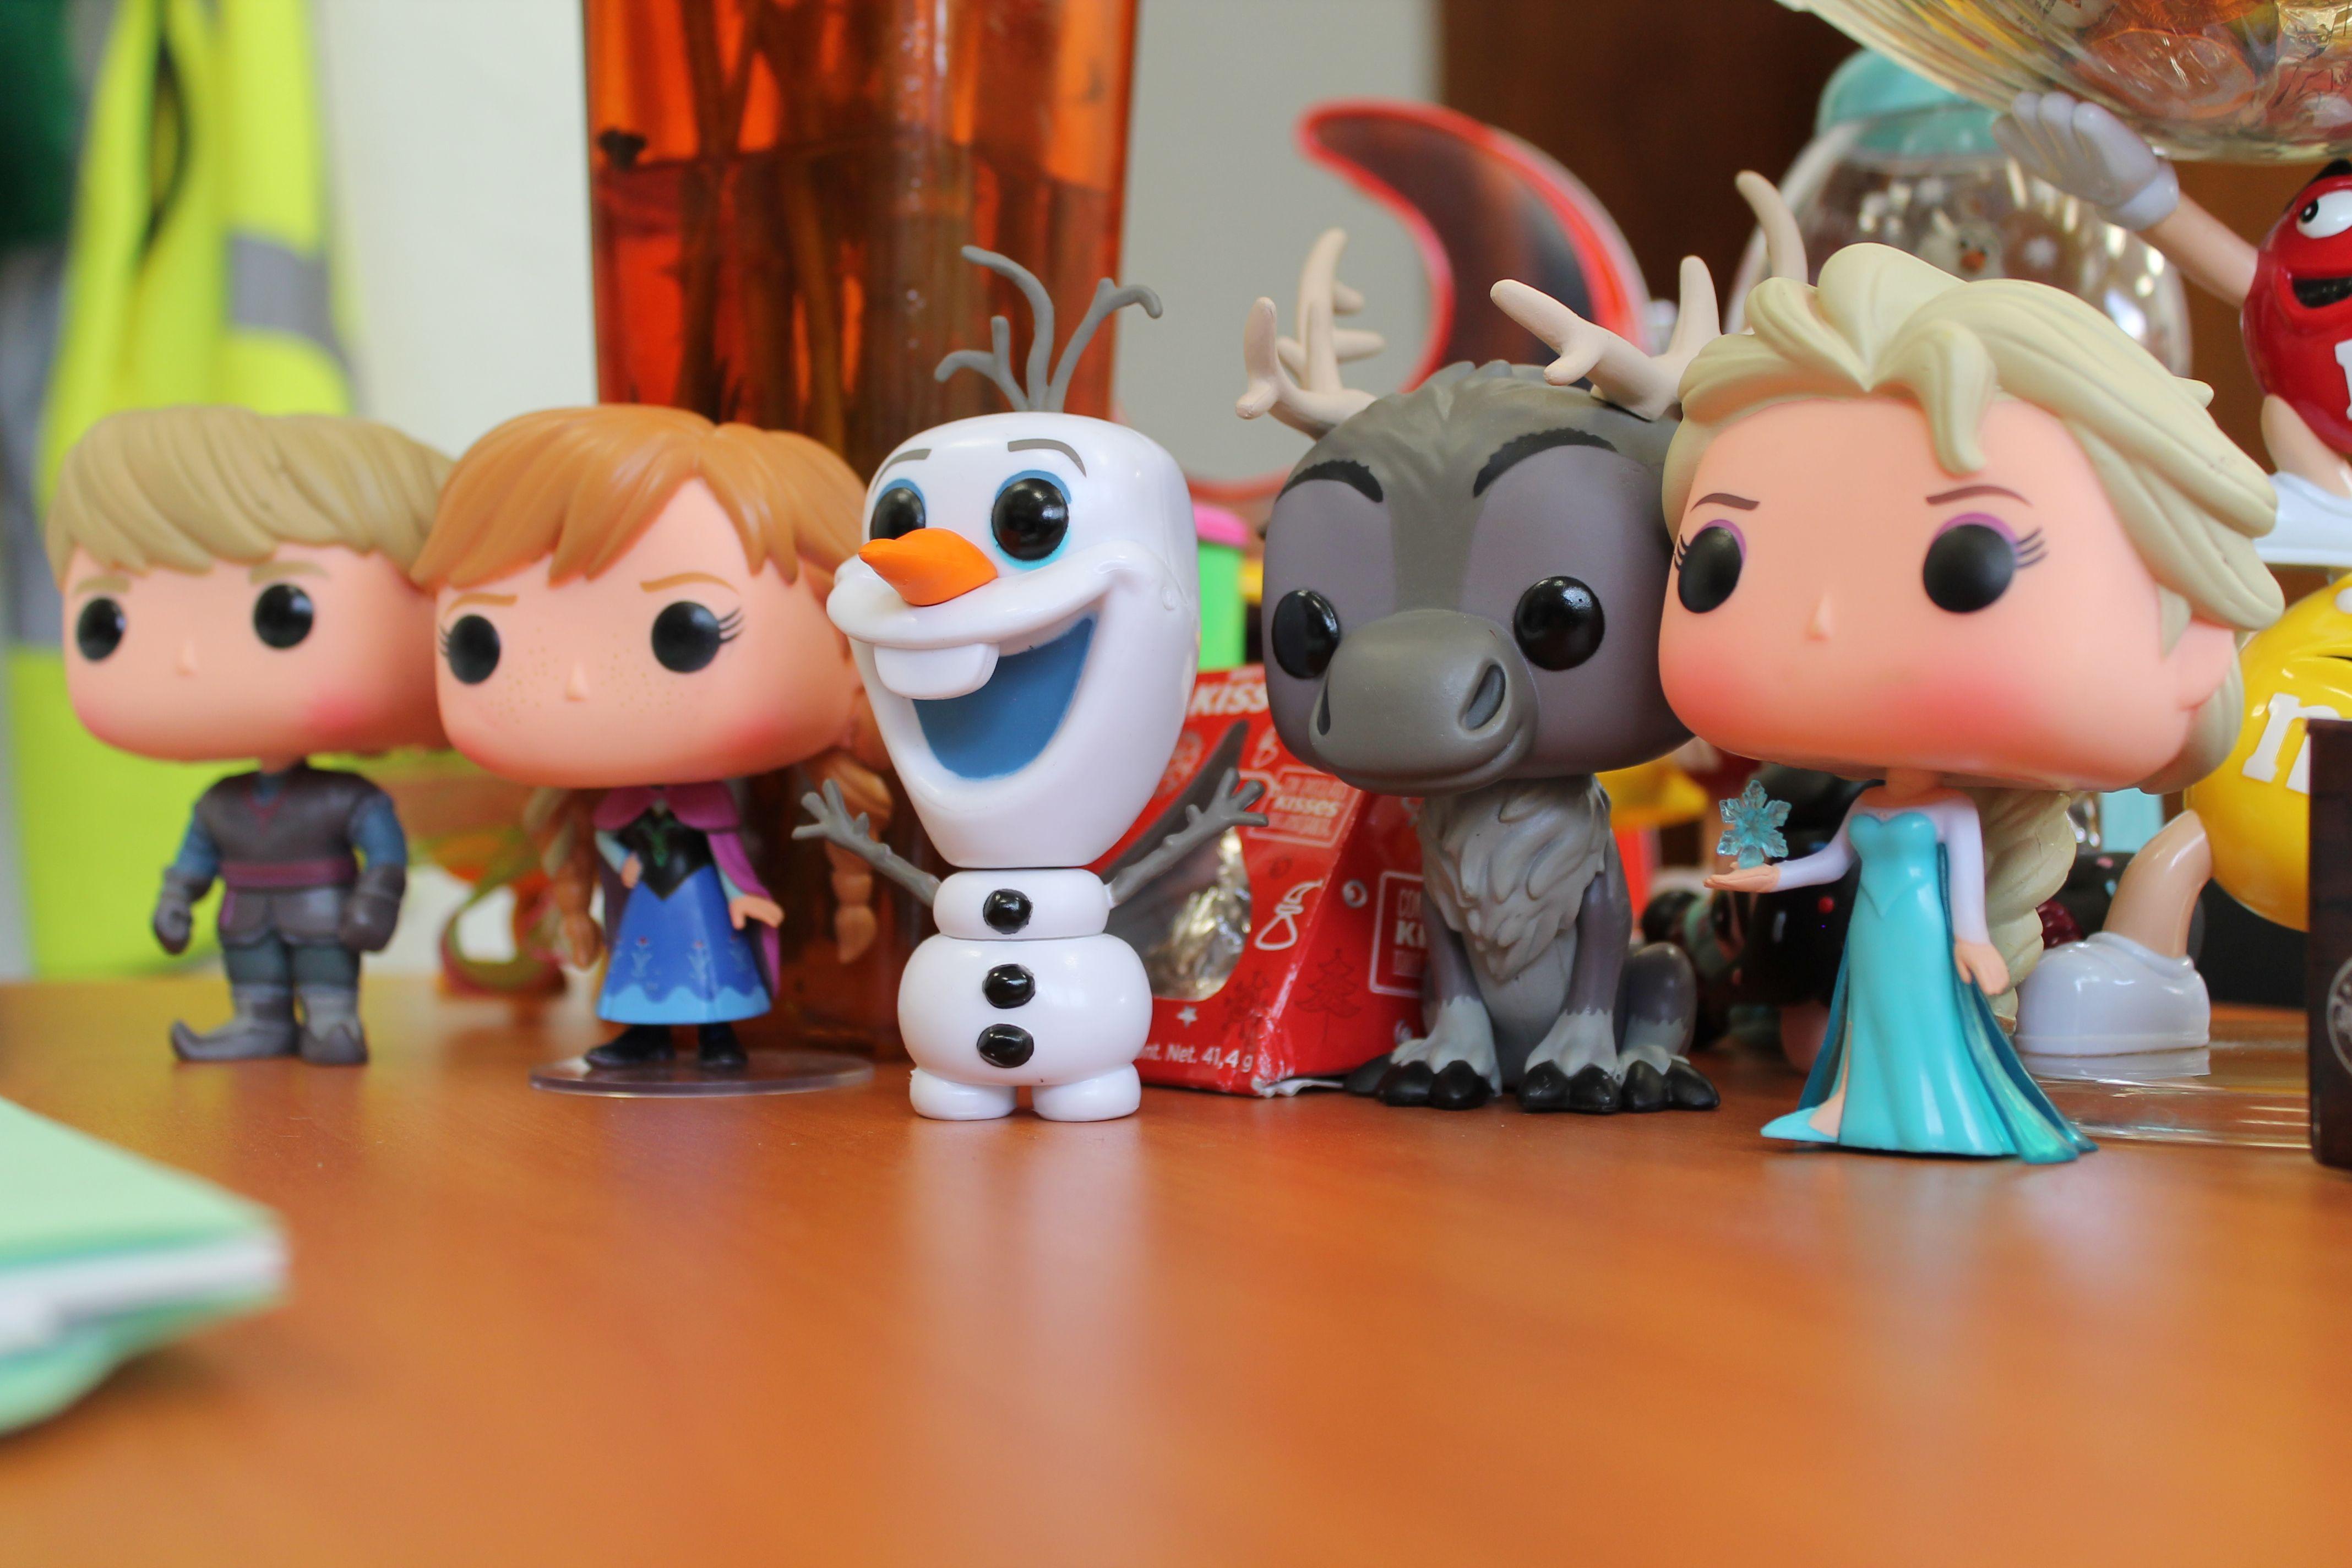 ANNA, ELSA, OLAF, SVEN KRISTOFF, LOVELY FUNKO POP